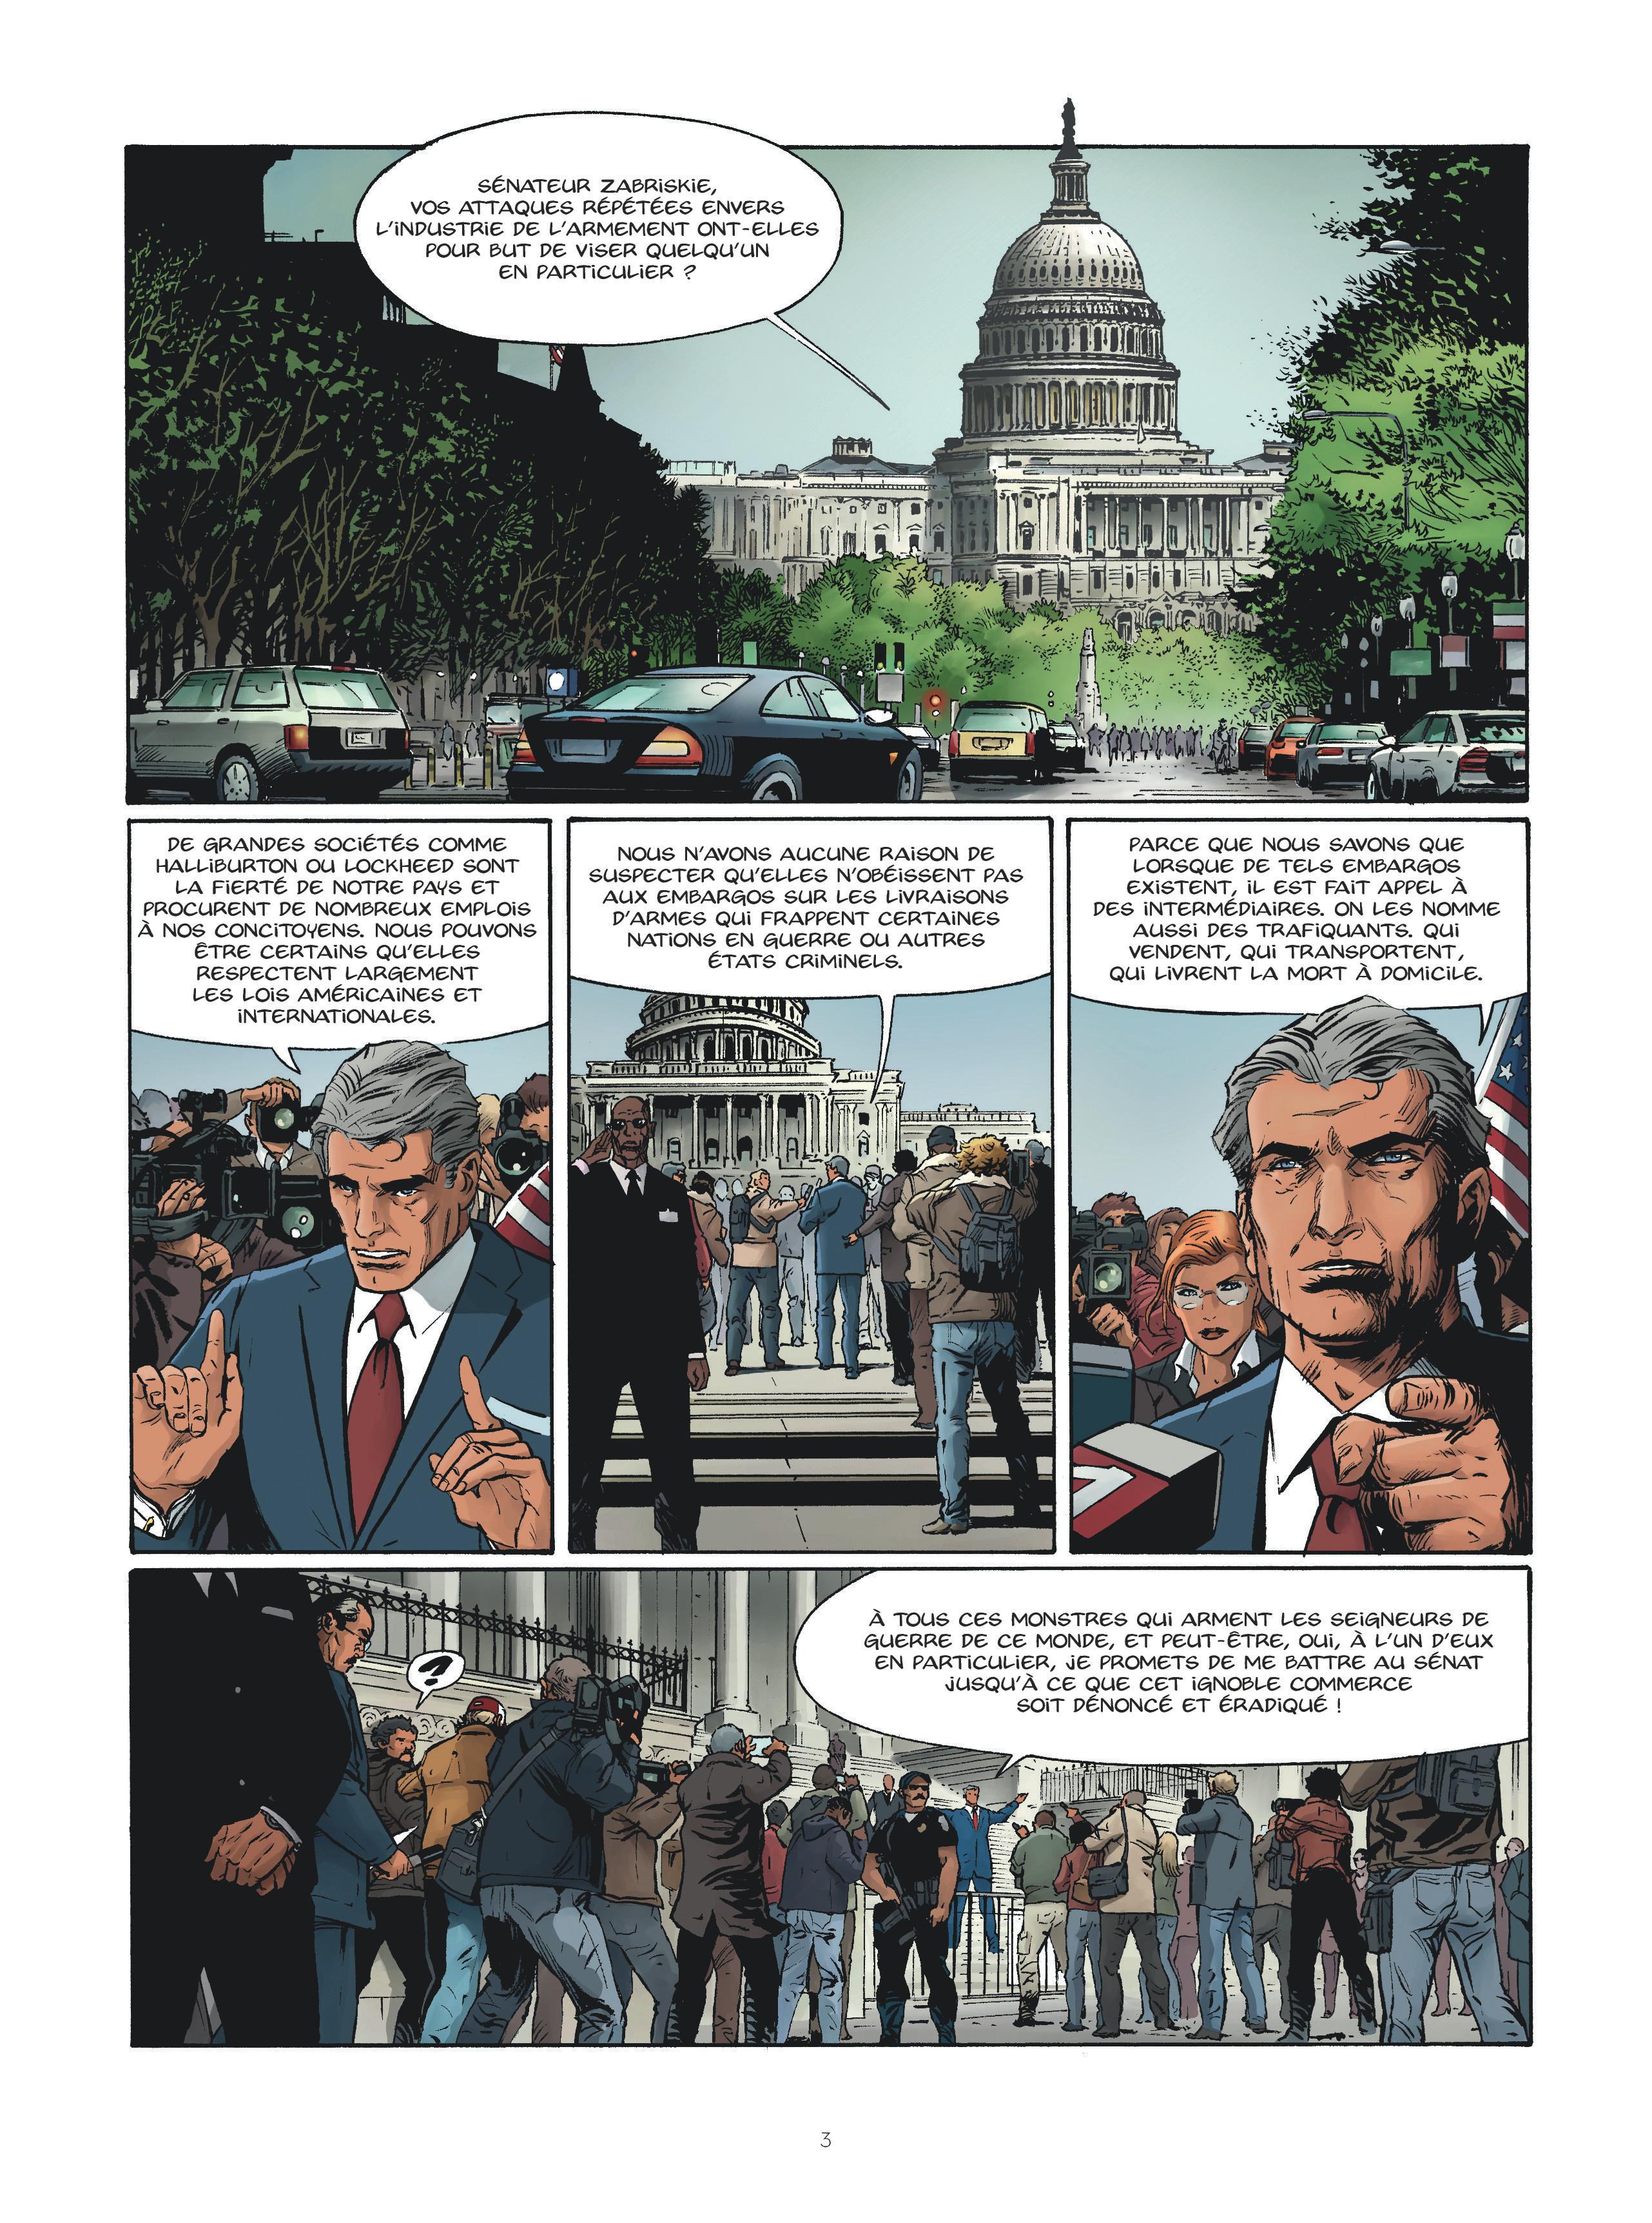 I.R.$#16_Page 3